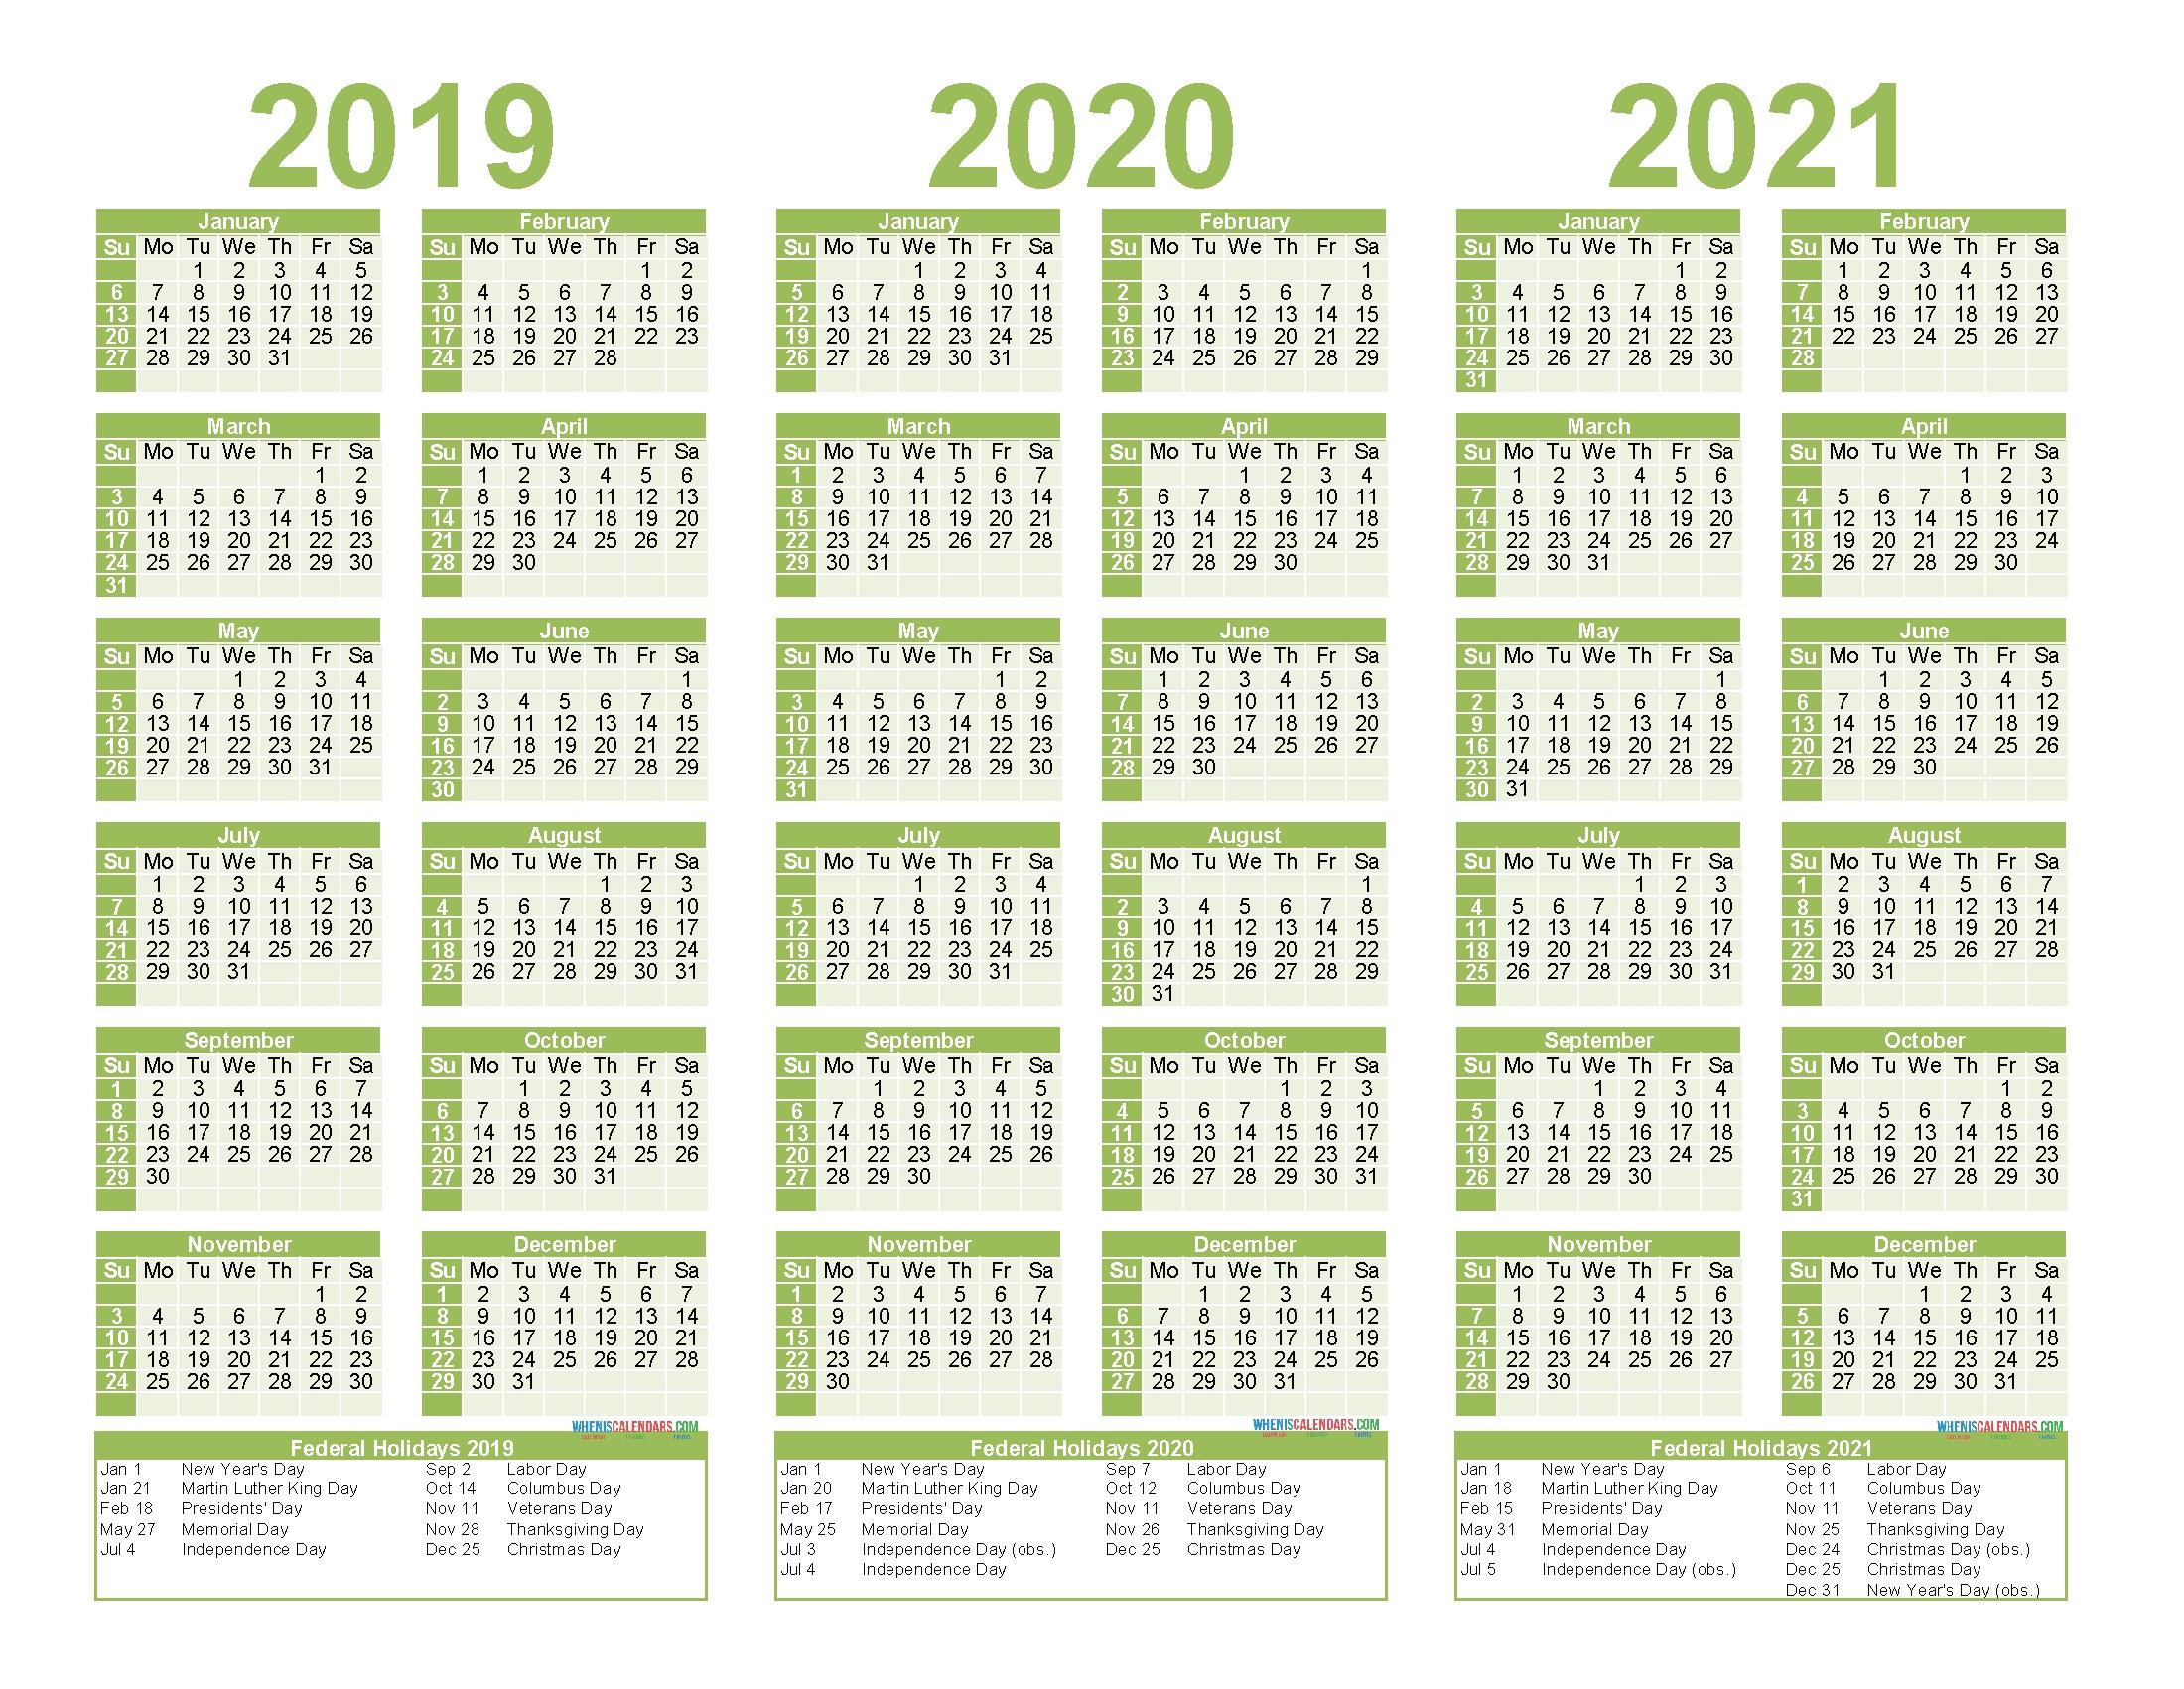 2019 To 2021 Calendar Printable Free Pdf, Word, Image regarding Three Year Calendar 2019 2021 2021 Calendar Pedia